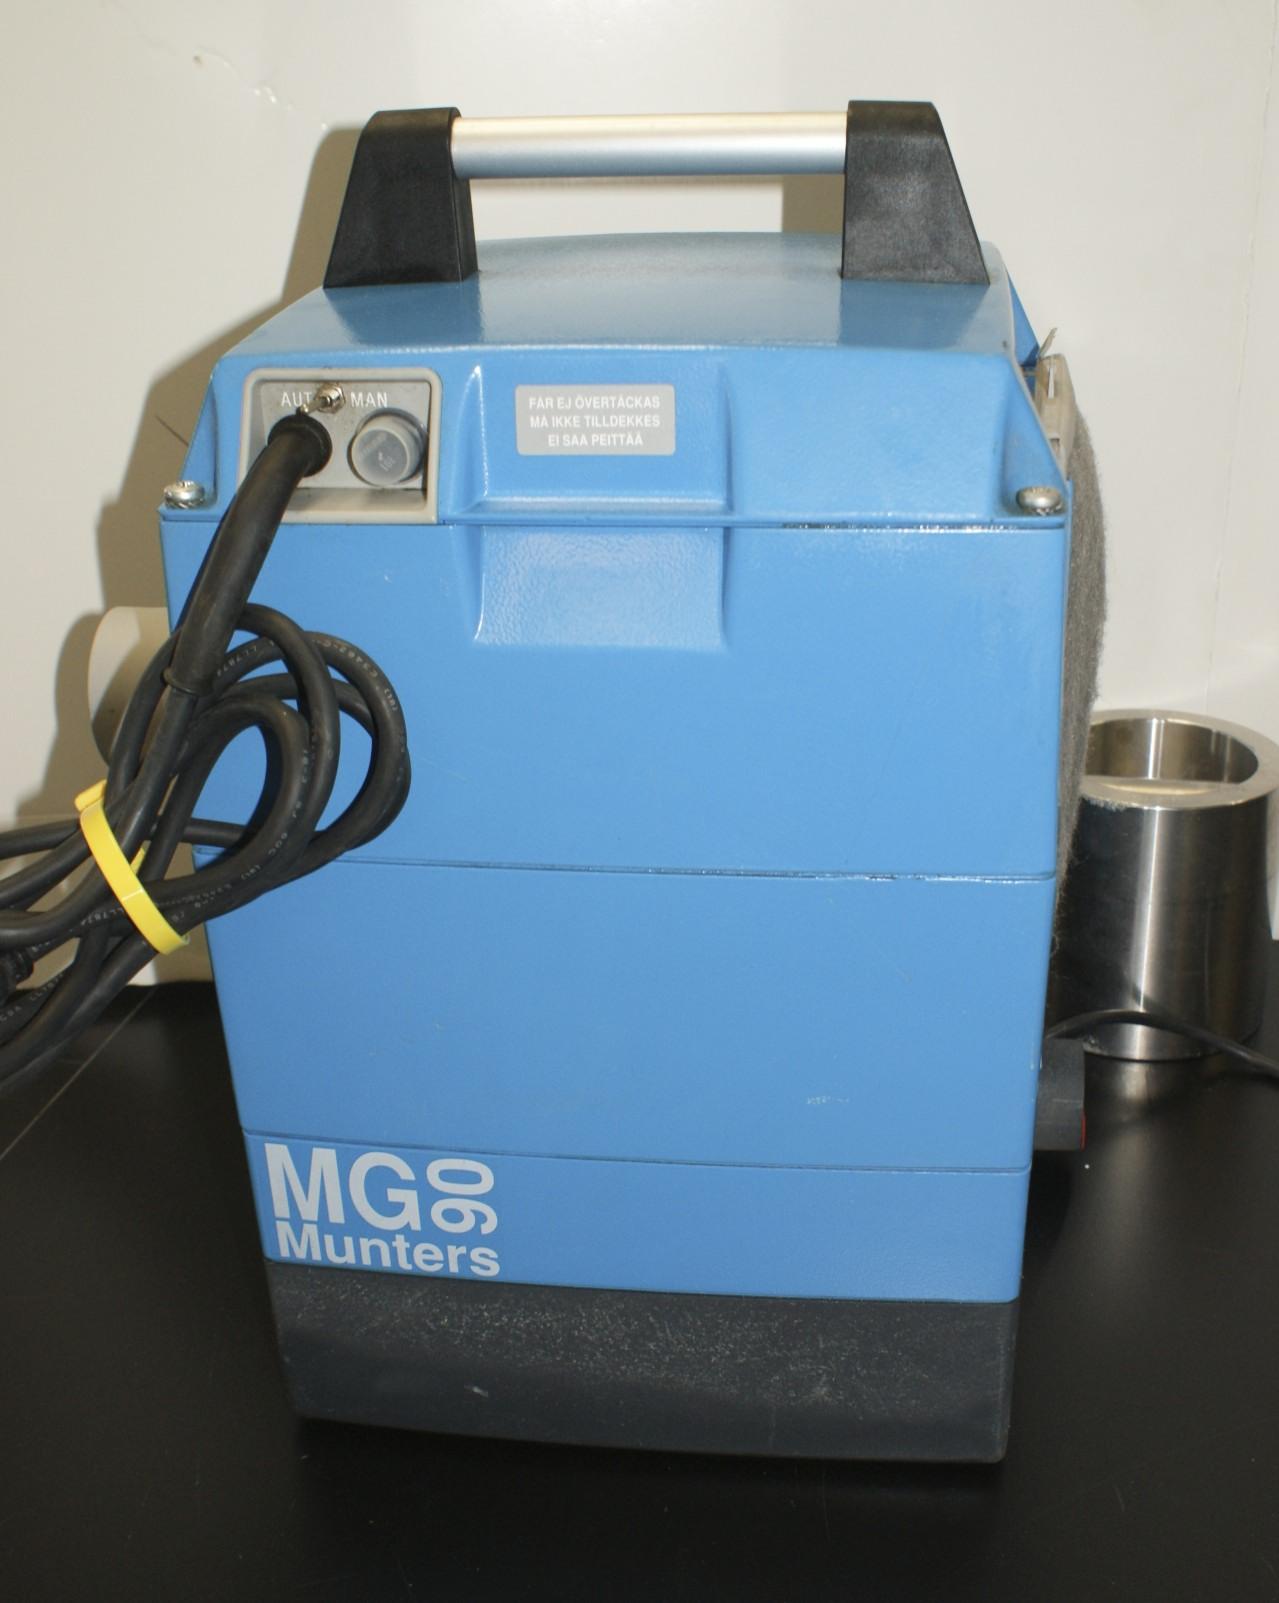 hight resolution of munters dehumidifier mg 90 munters mg90 munters mg 90 dehumidifier 2115 volt used nice